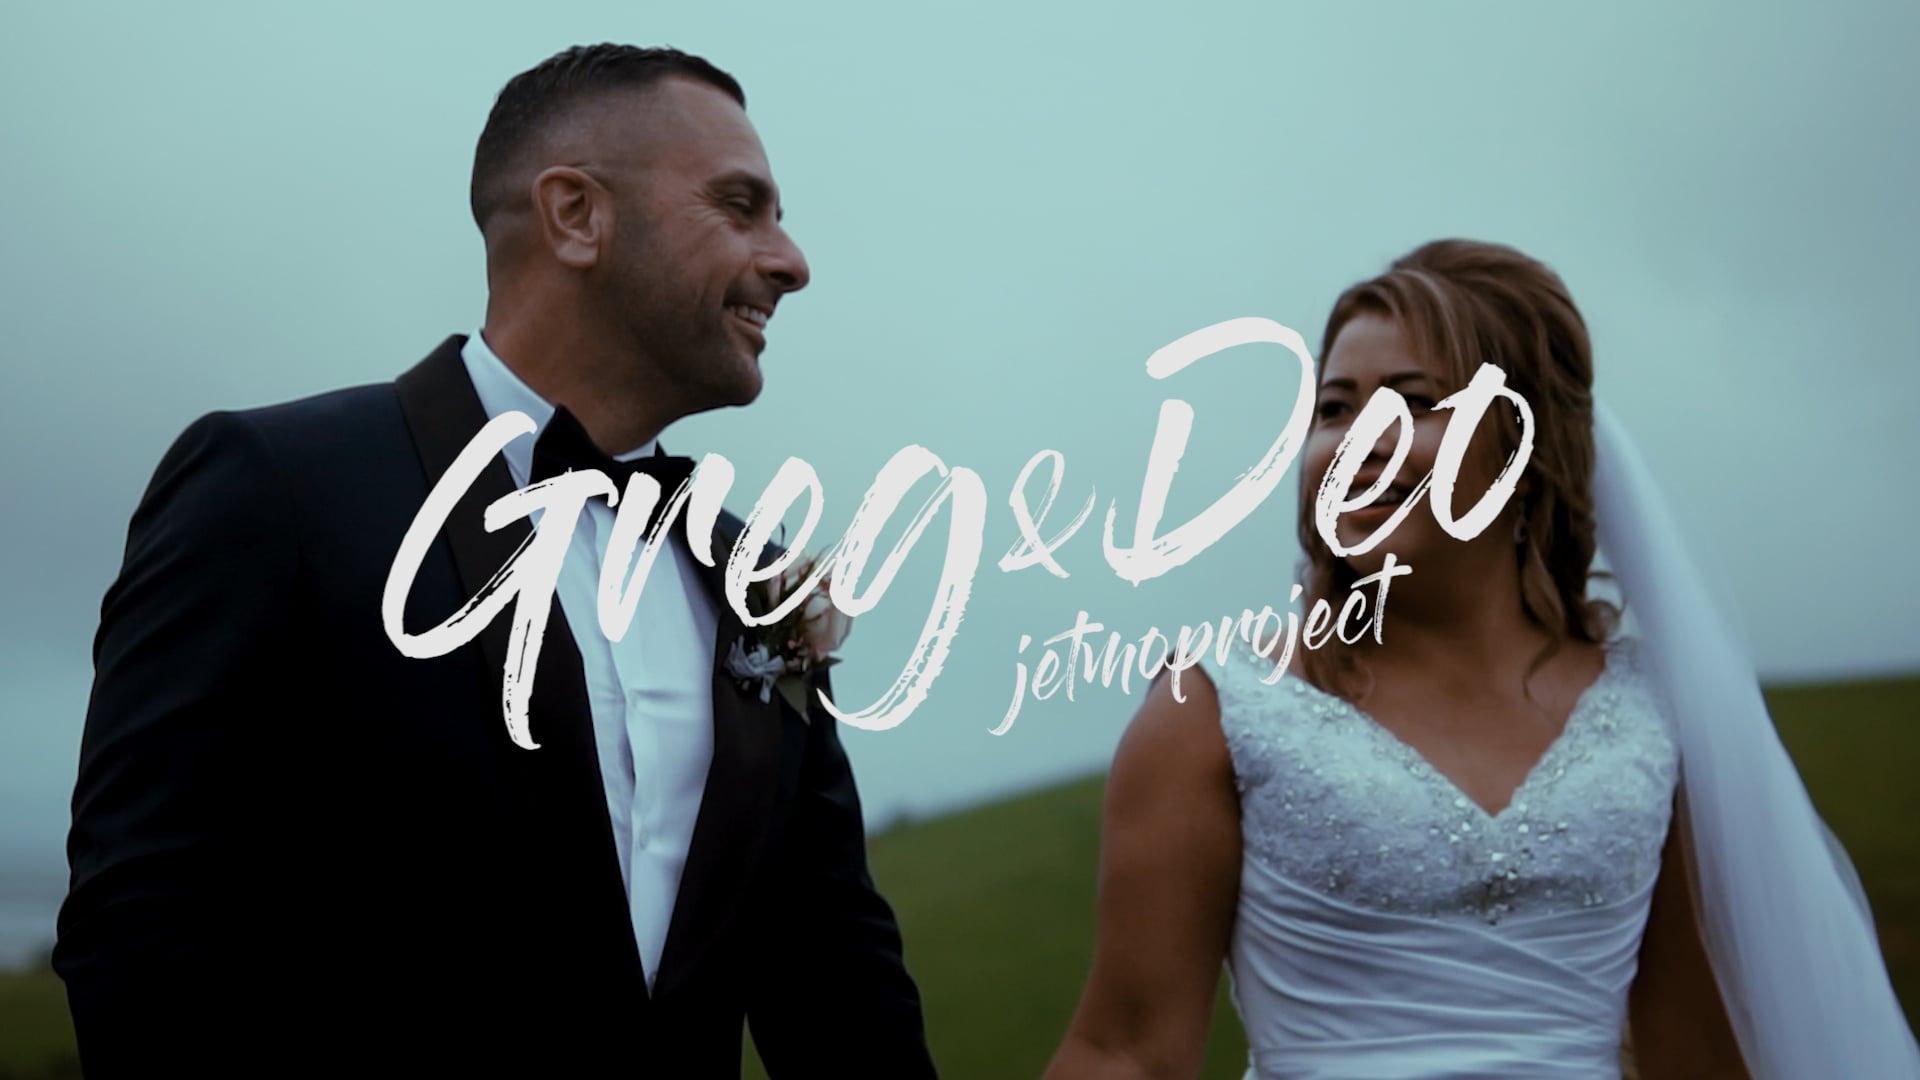 Greg & Deo